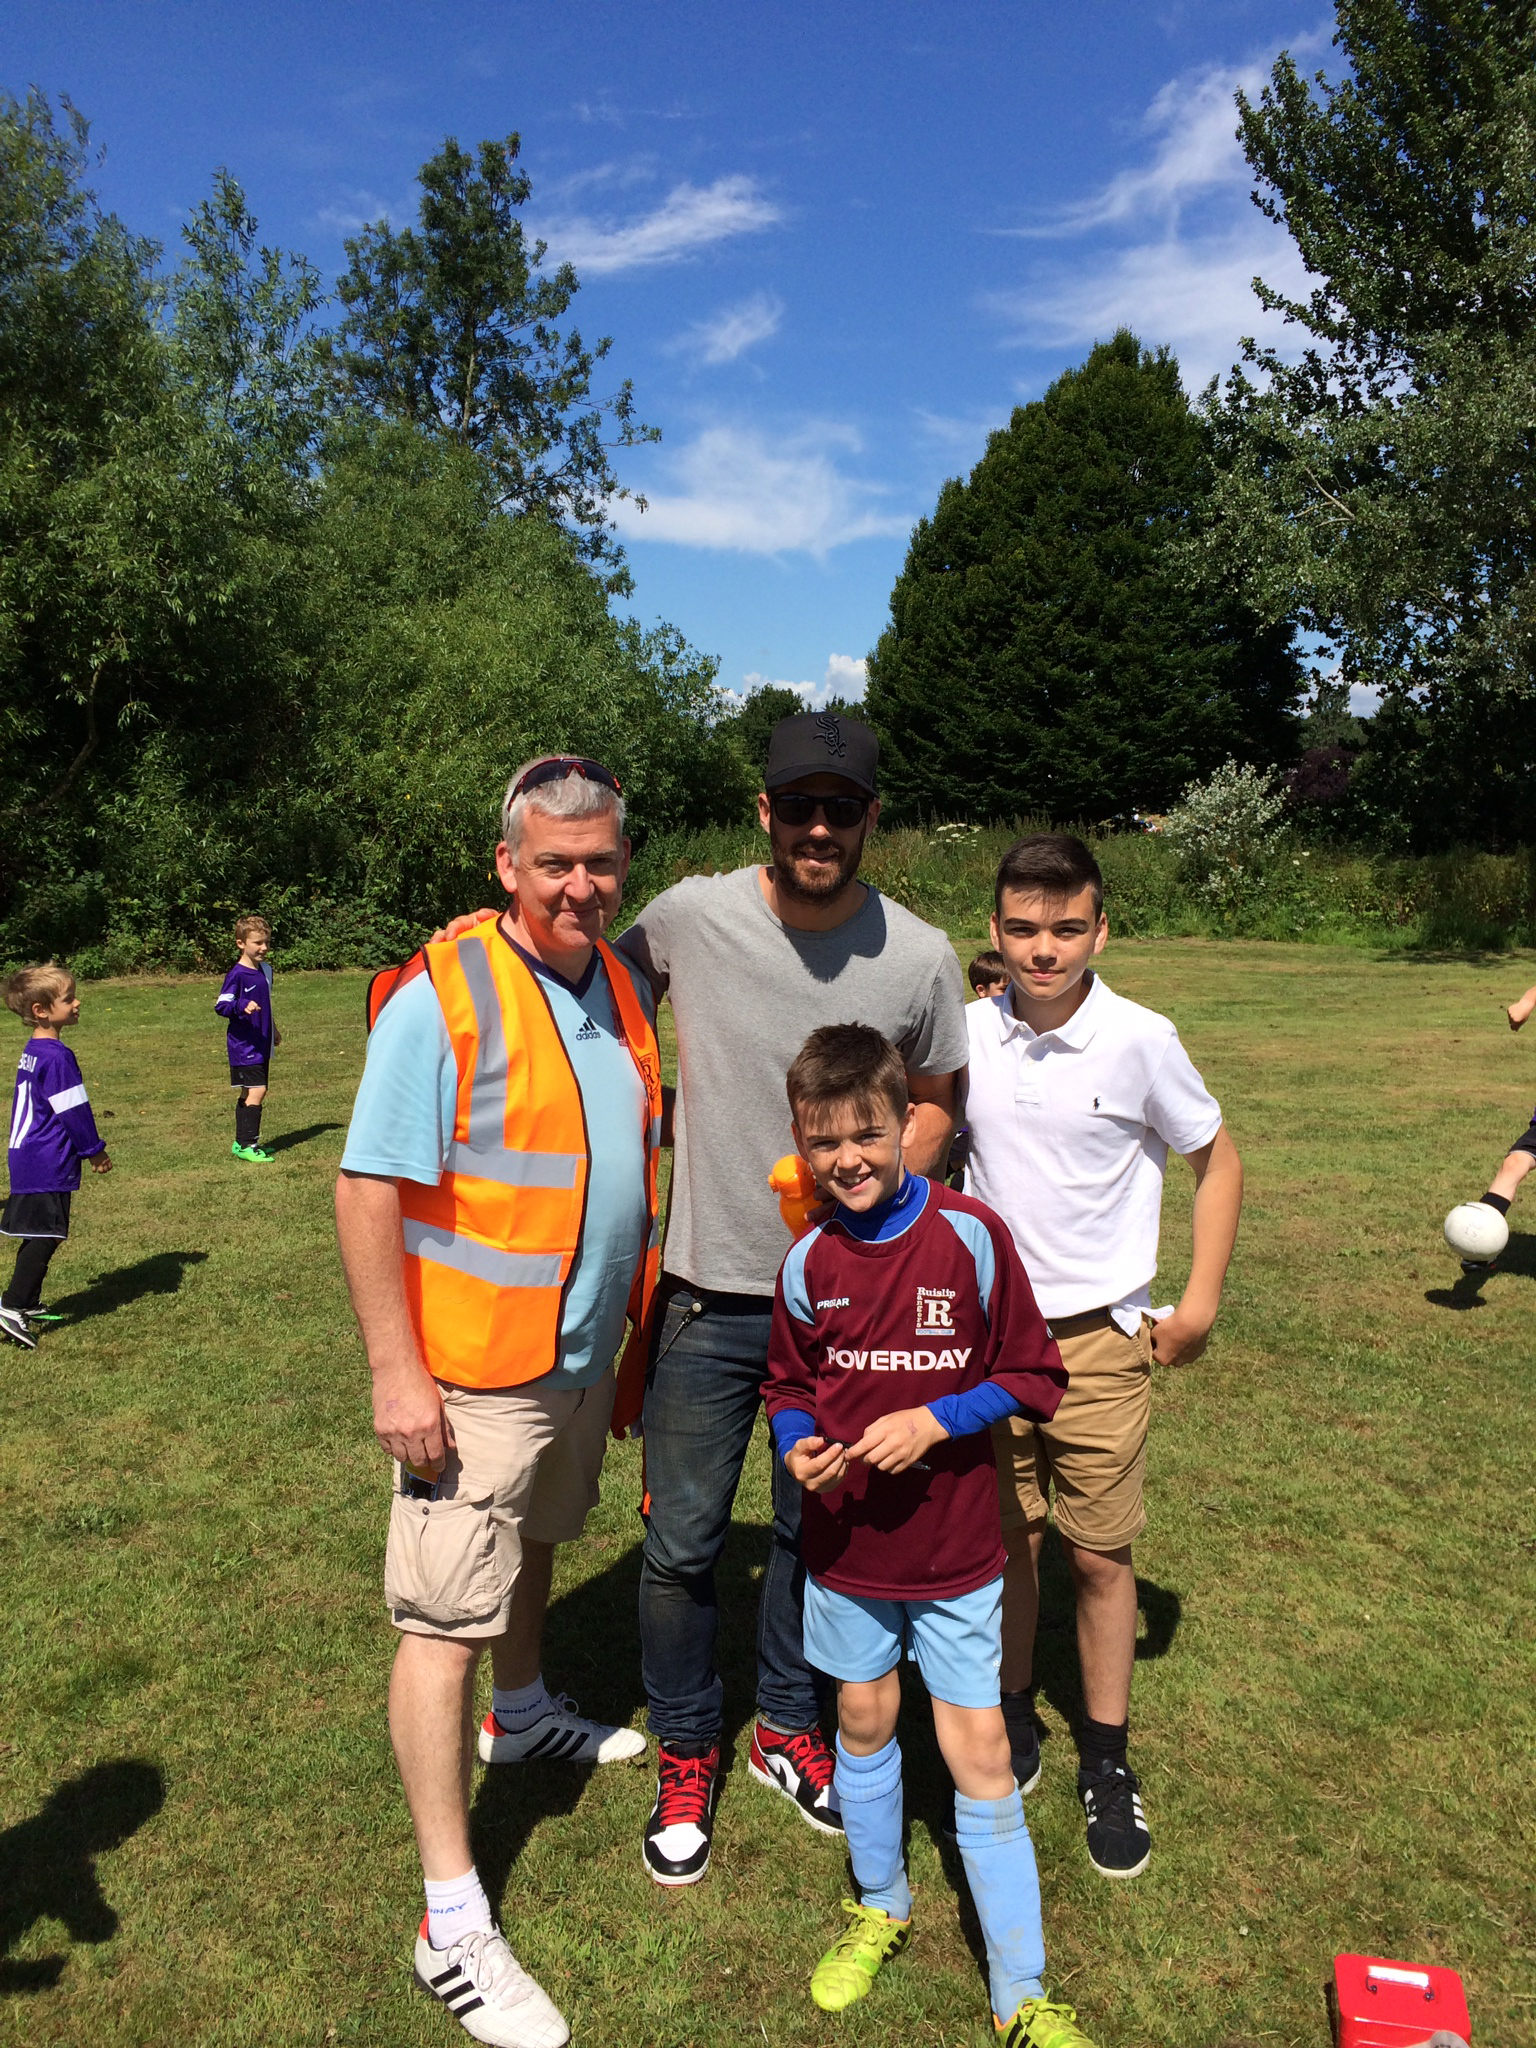 John, Michael and Sean Gowen meet Jamie Redknapp at our tournament in June 2014